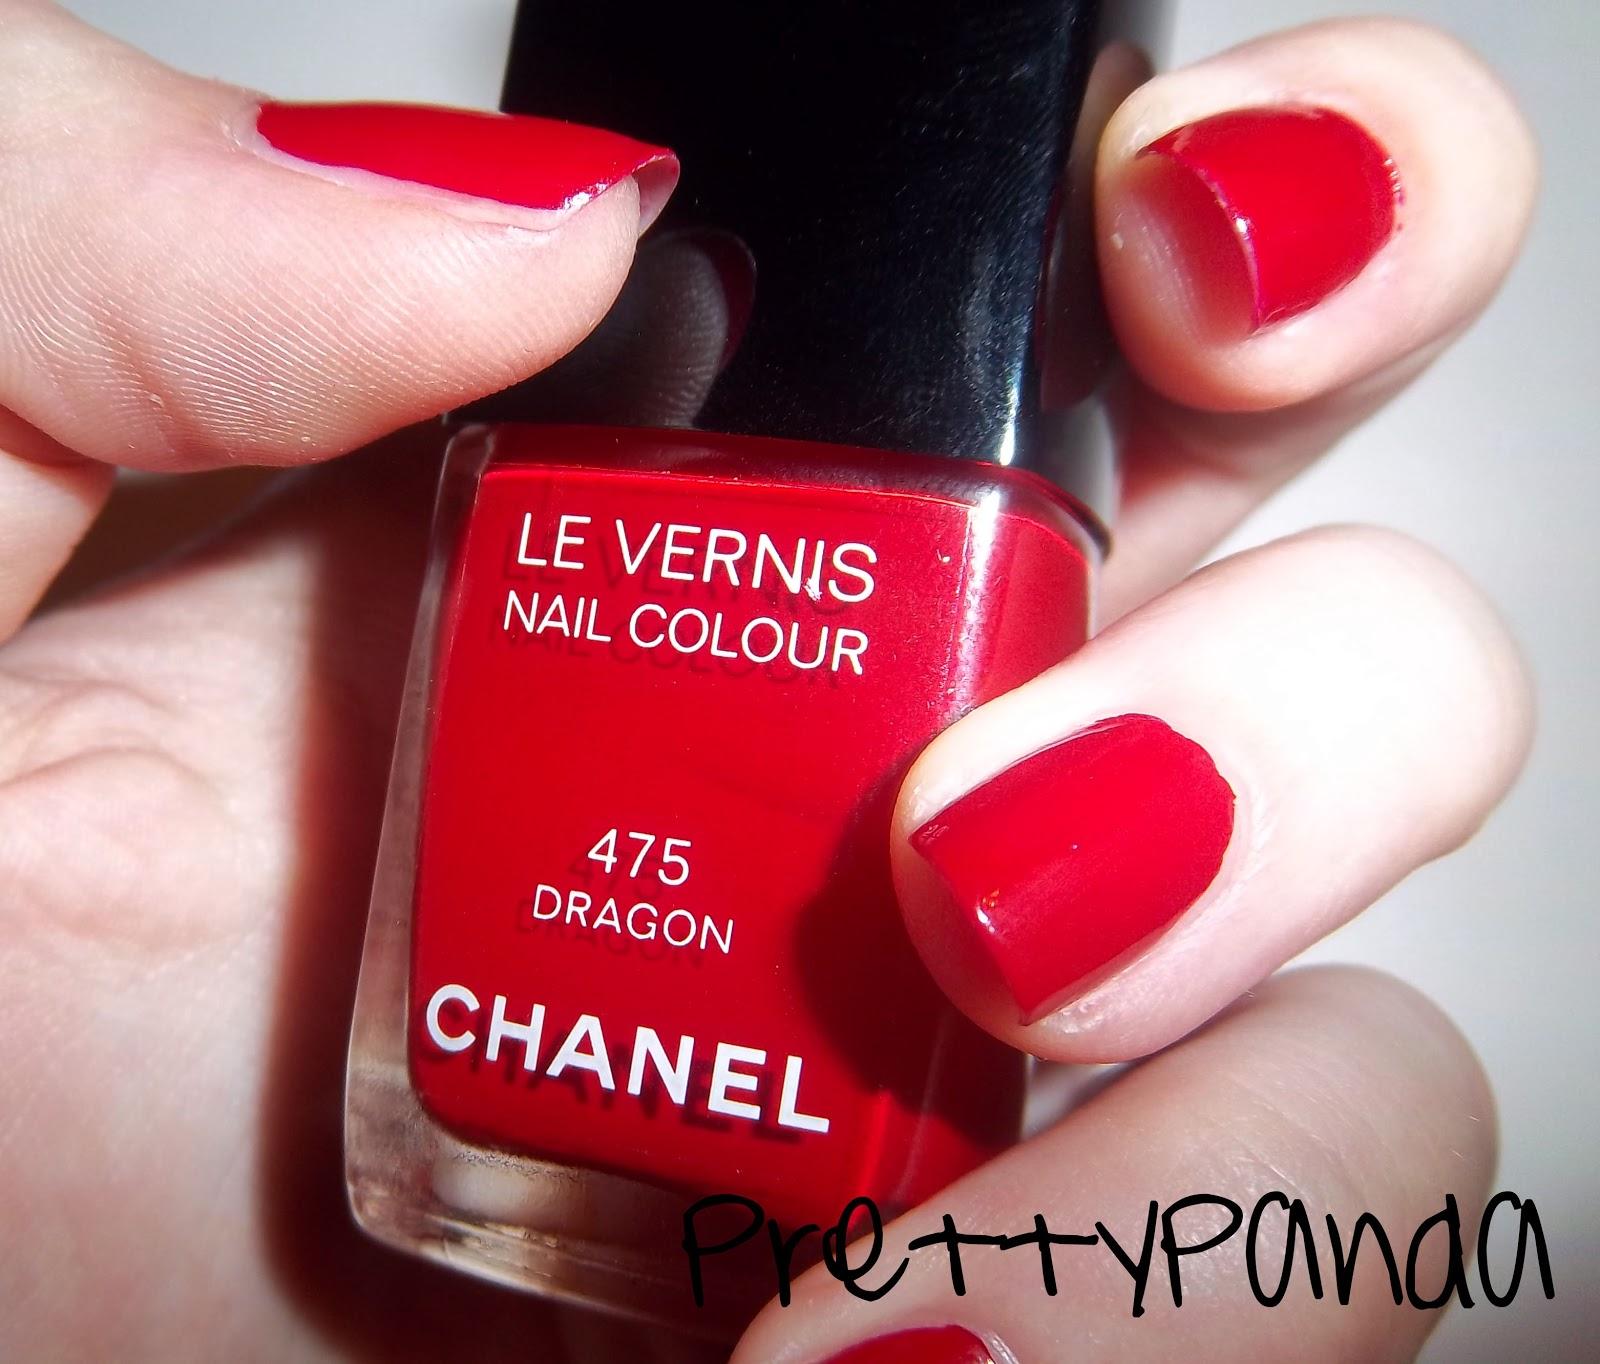 PrettyPanda: Chanel Dragon: Nail Polish Swatches And Review